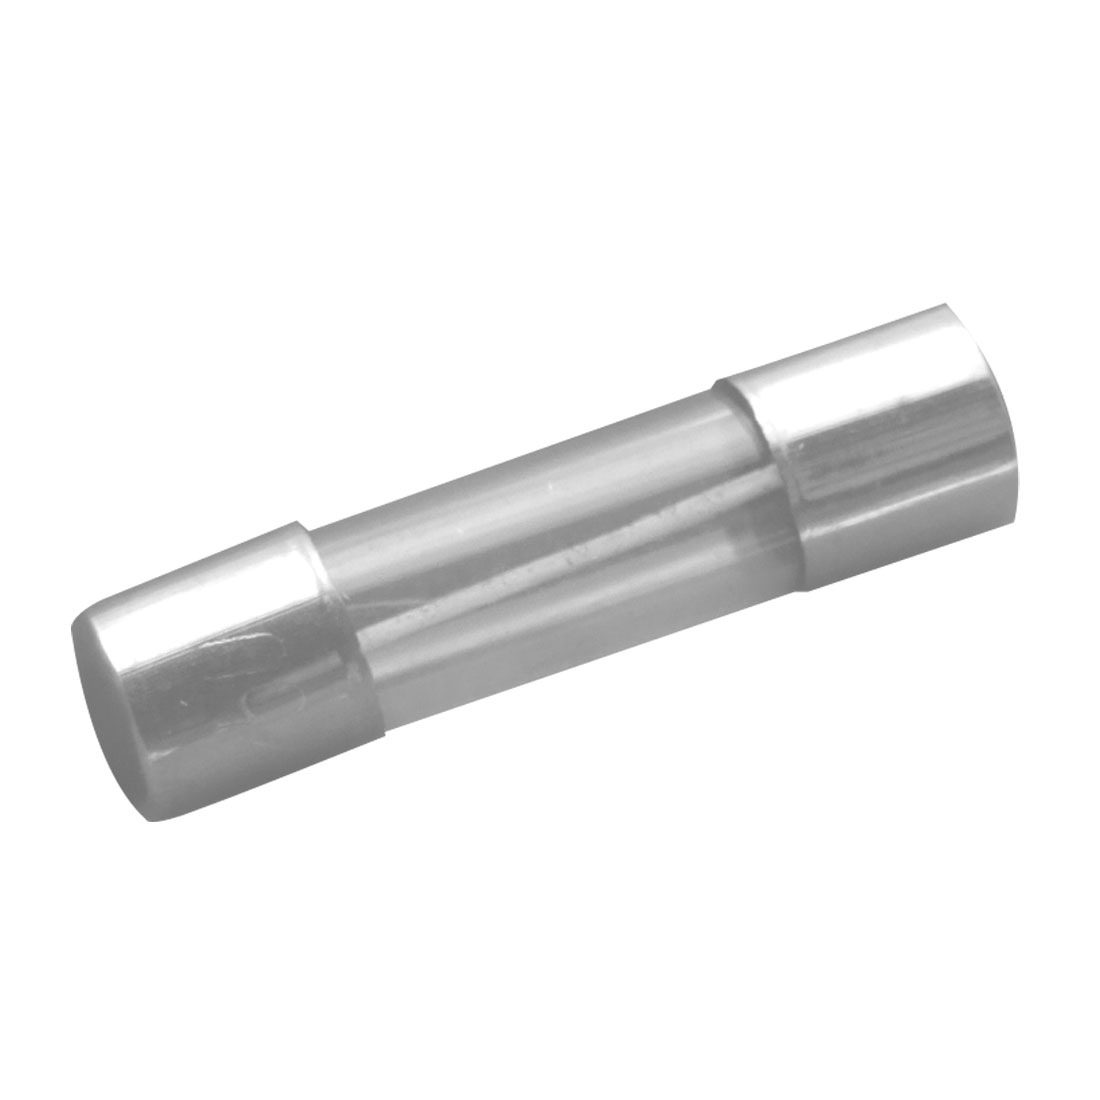 100pcs 5A 250V 5 x 20mm Fuses Tubes Electron Component